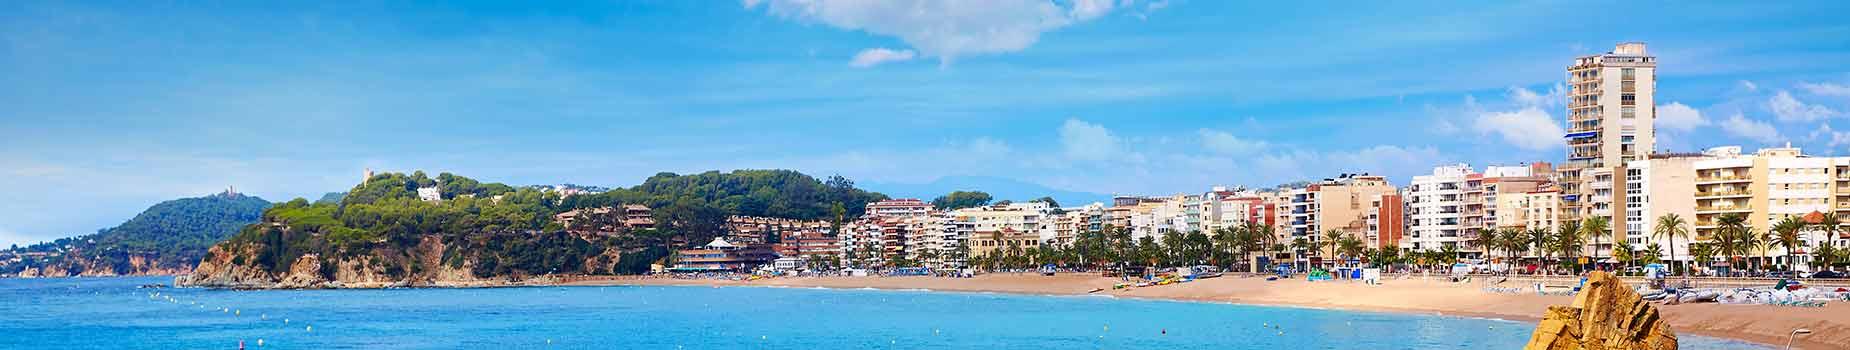 Buspendel Playa d'Aro